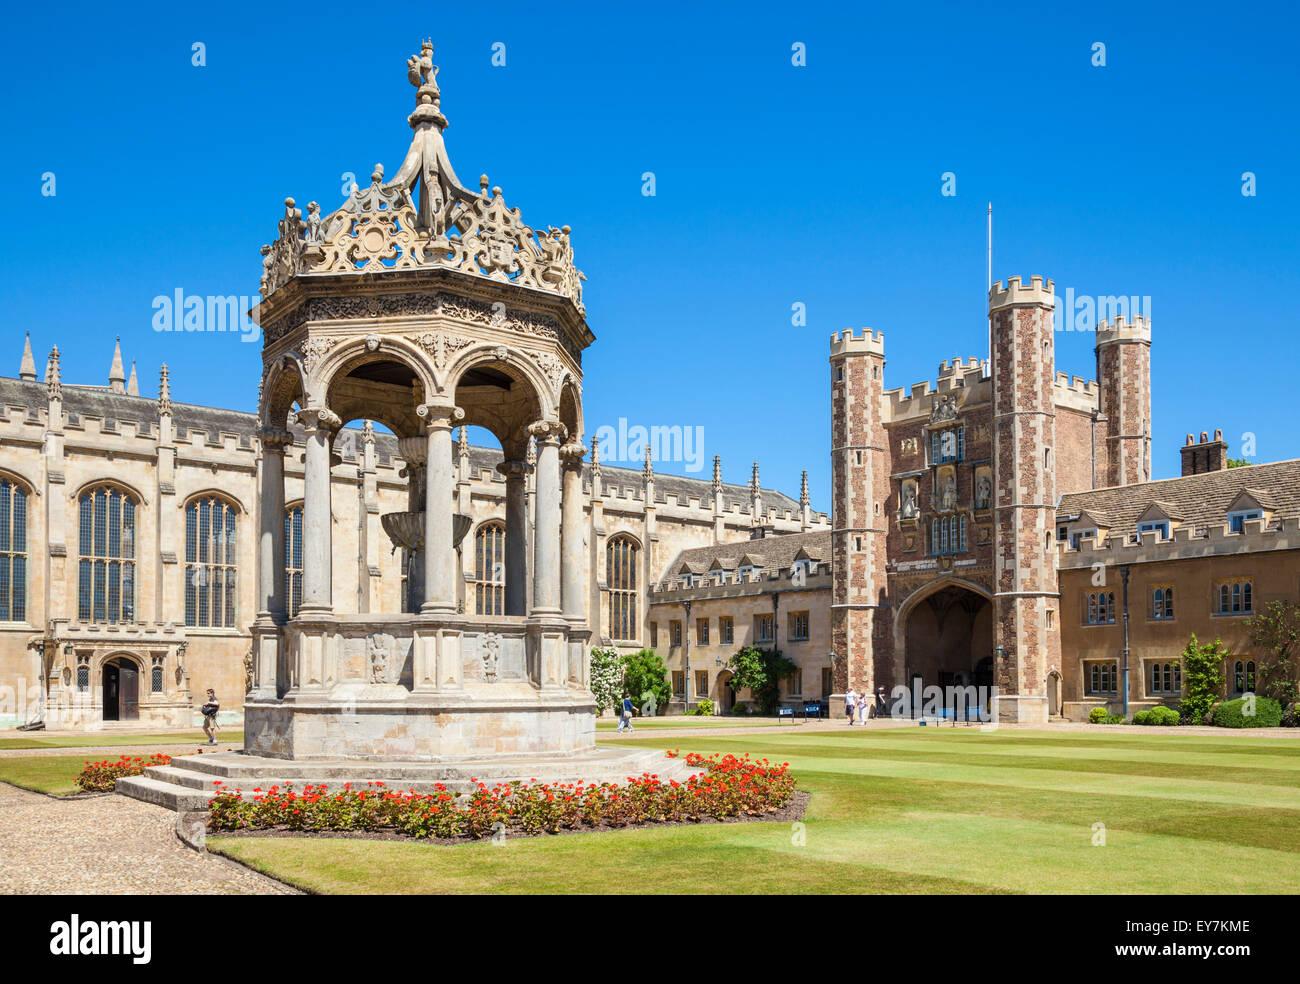 The Great Court Trinity College Cambridge University Cambridge Cambridgeshire England UK GB EU Europe Stock Photo